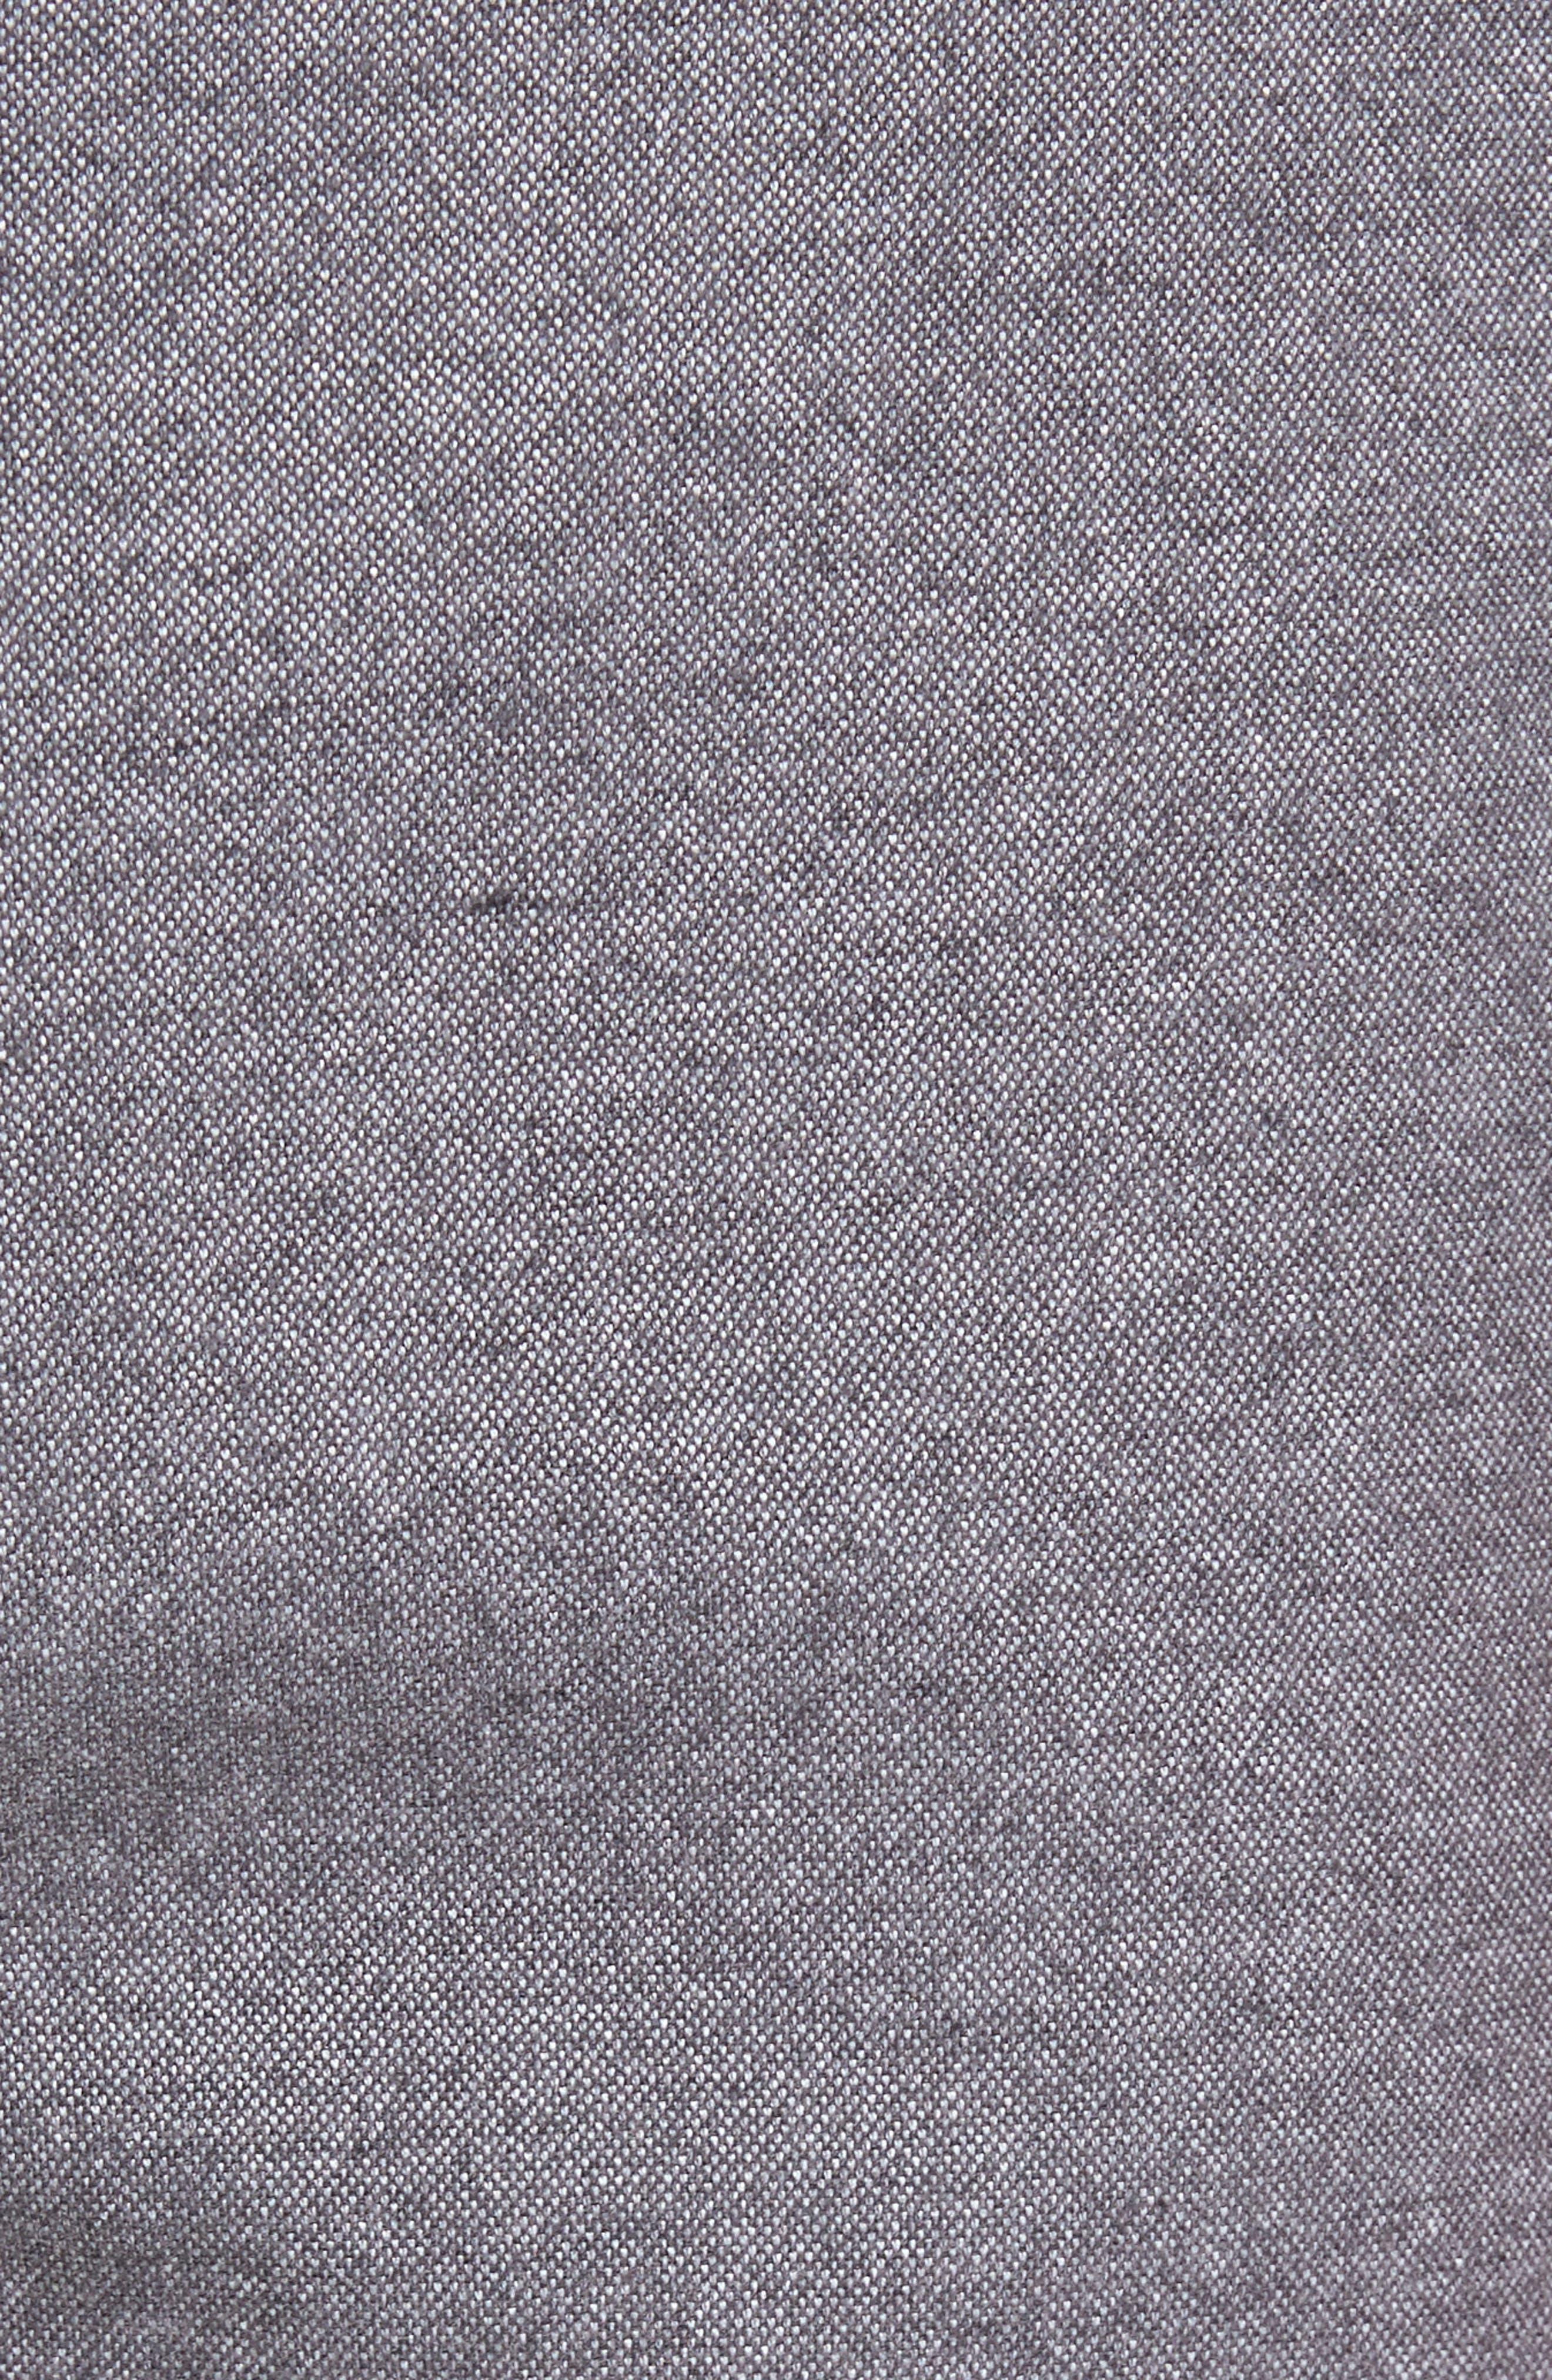 Straight Fit Oxford Burgee Pants,                             Alternate thumbnail 5, color,